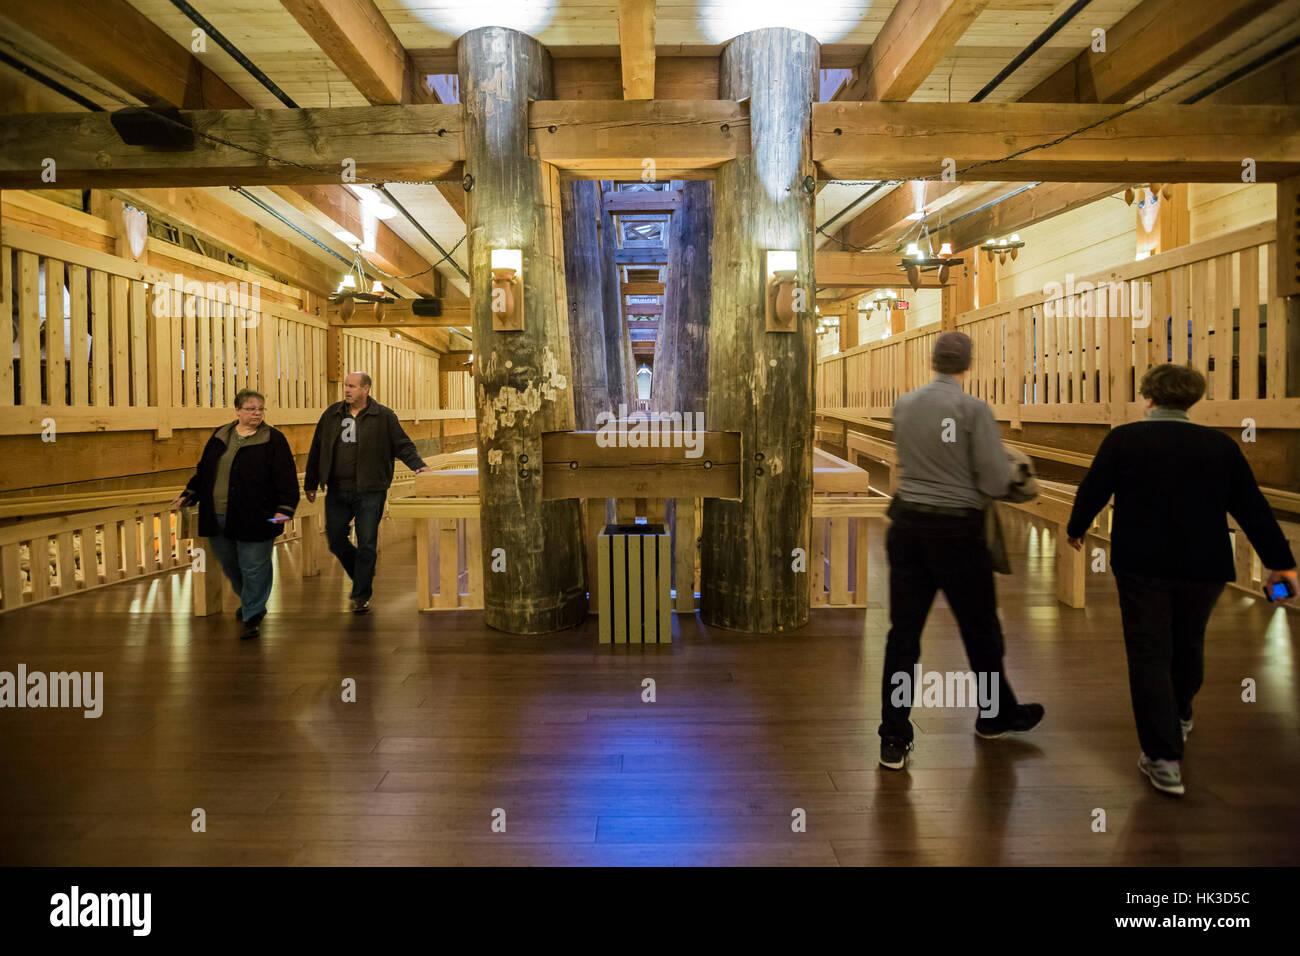 Williamstown, Kentucky - Visitors walk between decks at the Ark Encounter, a full-sized model of Noah's Ark. - Stock Image